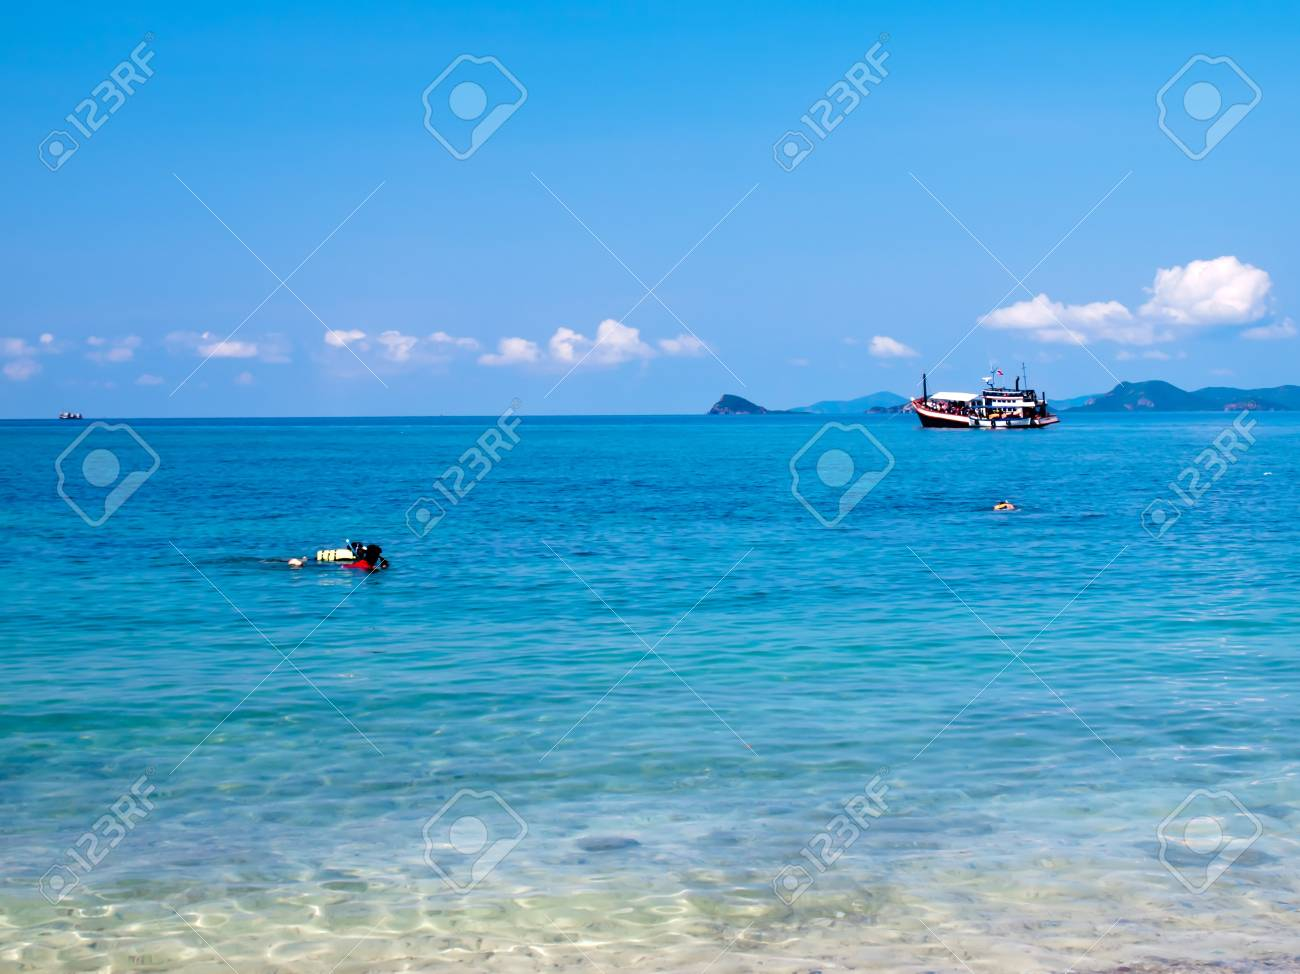 Skindive and cruising at Ko Kham island, Sattahip, Chon Buri, Thailand Stock Photo - 16852022